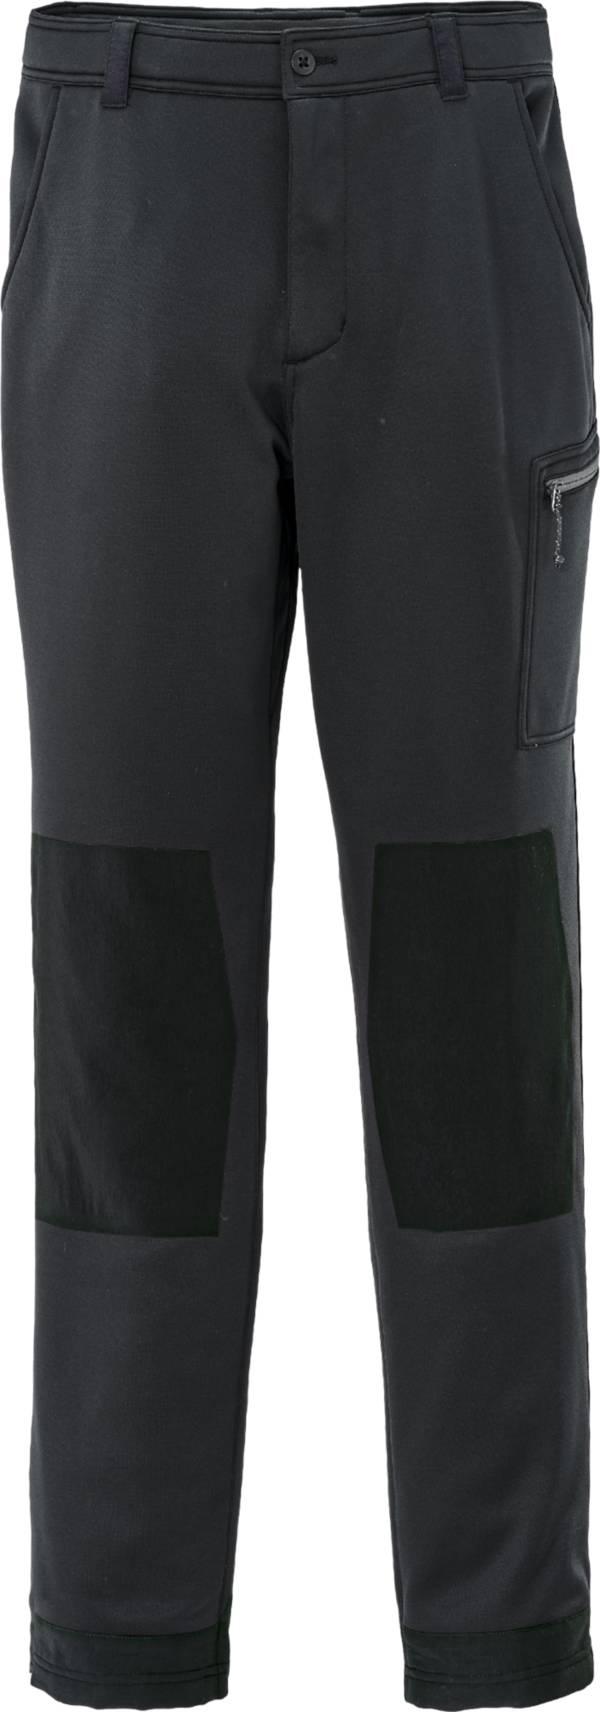 Striker Men's Waypoint Pant product image